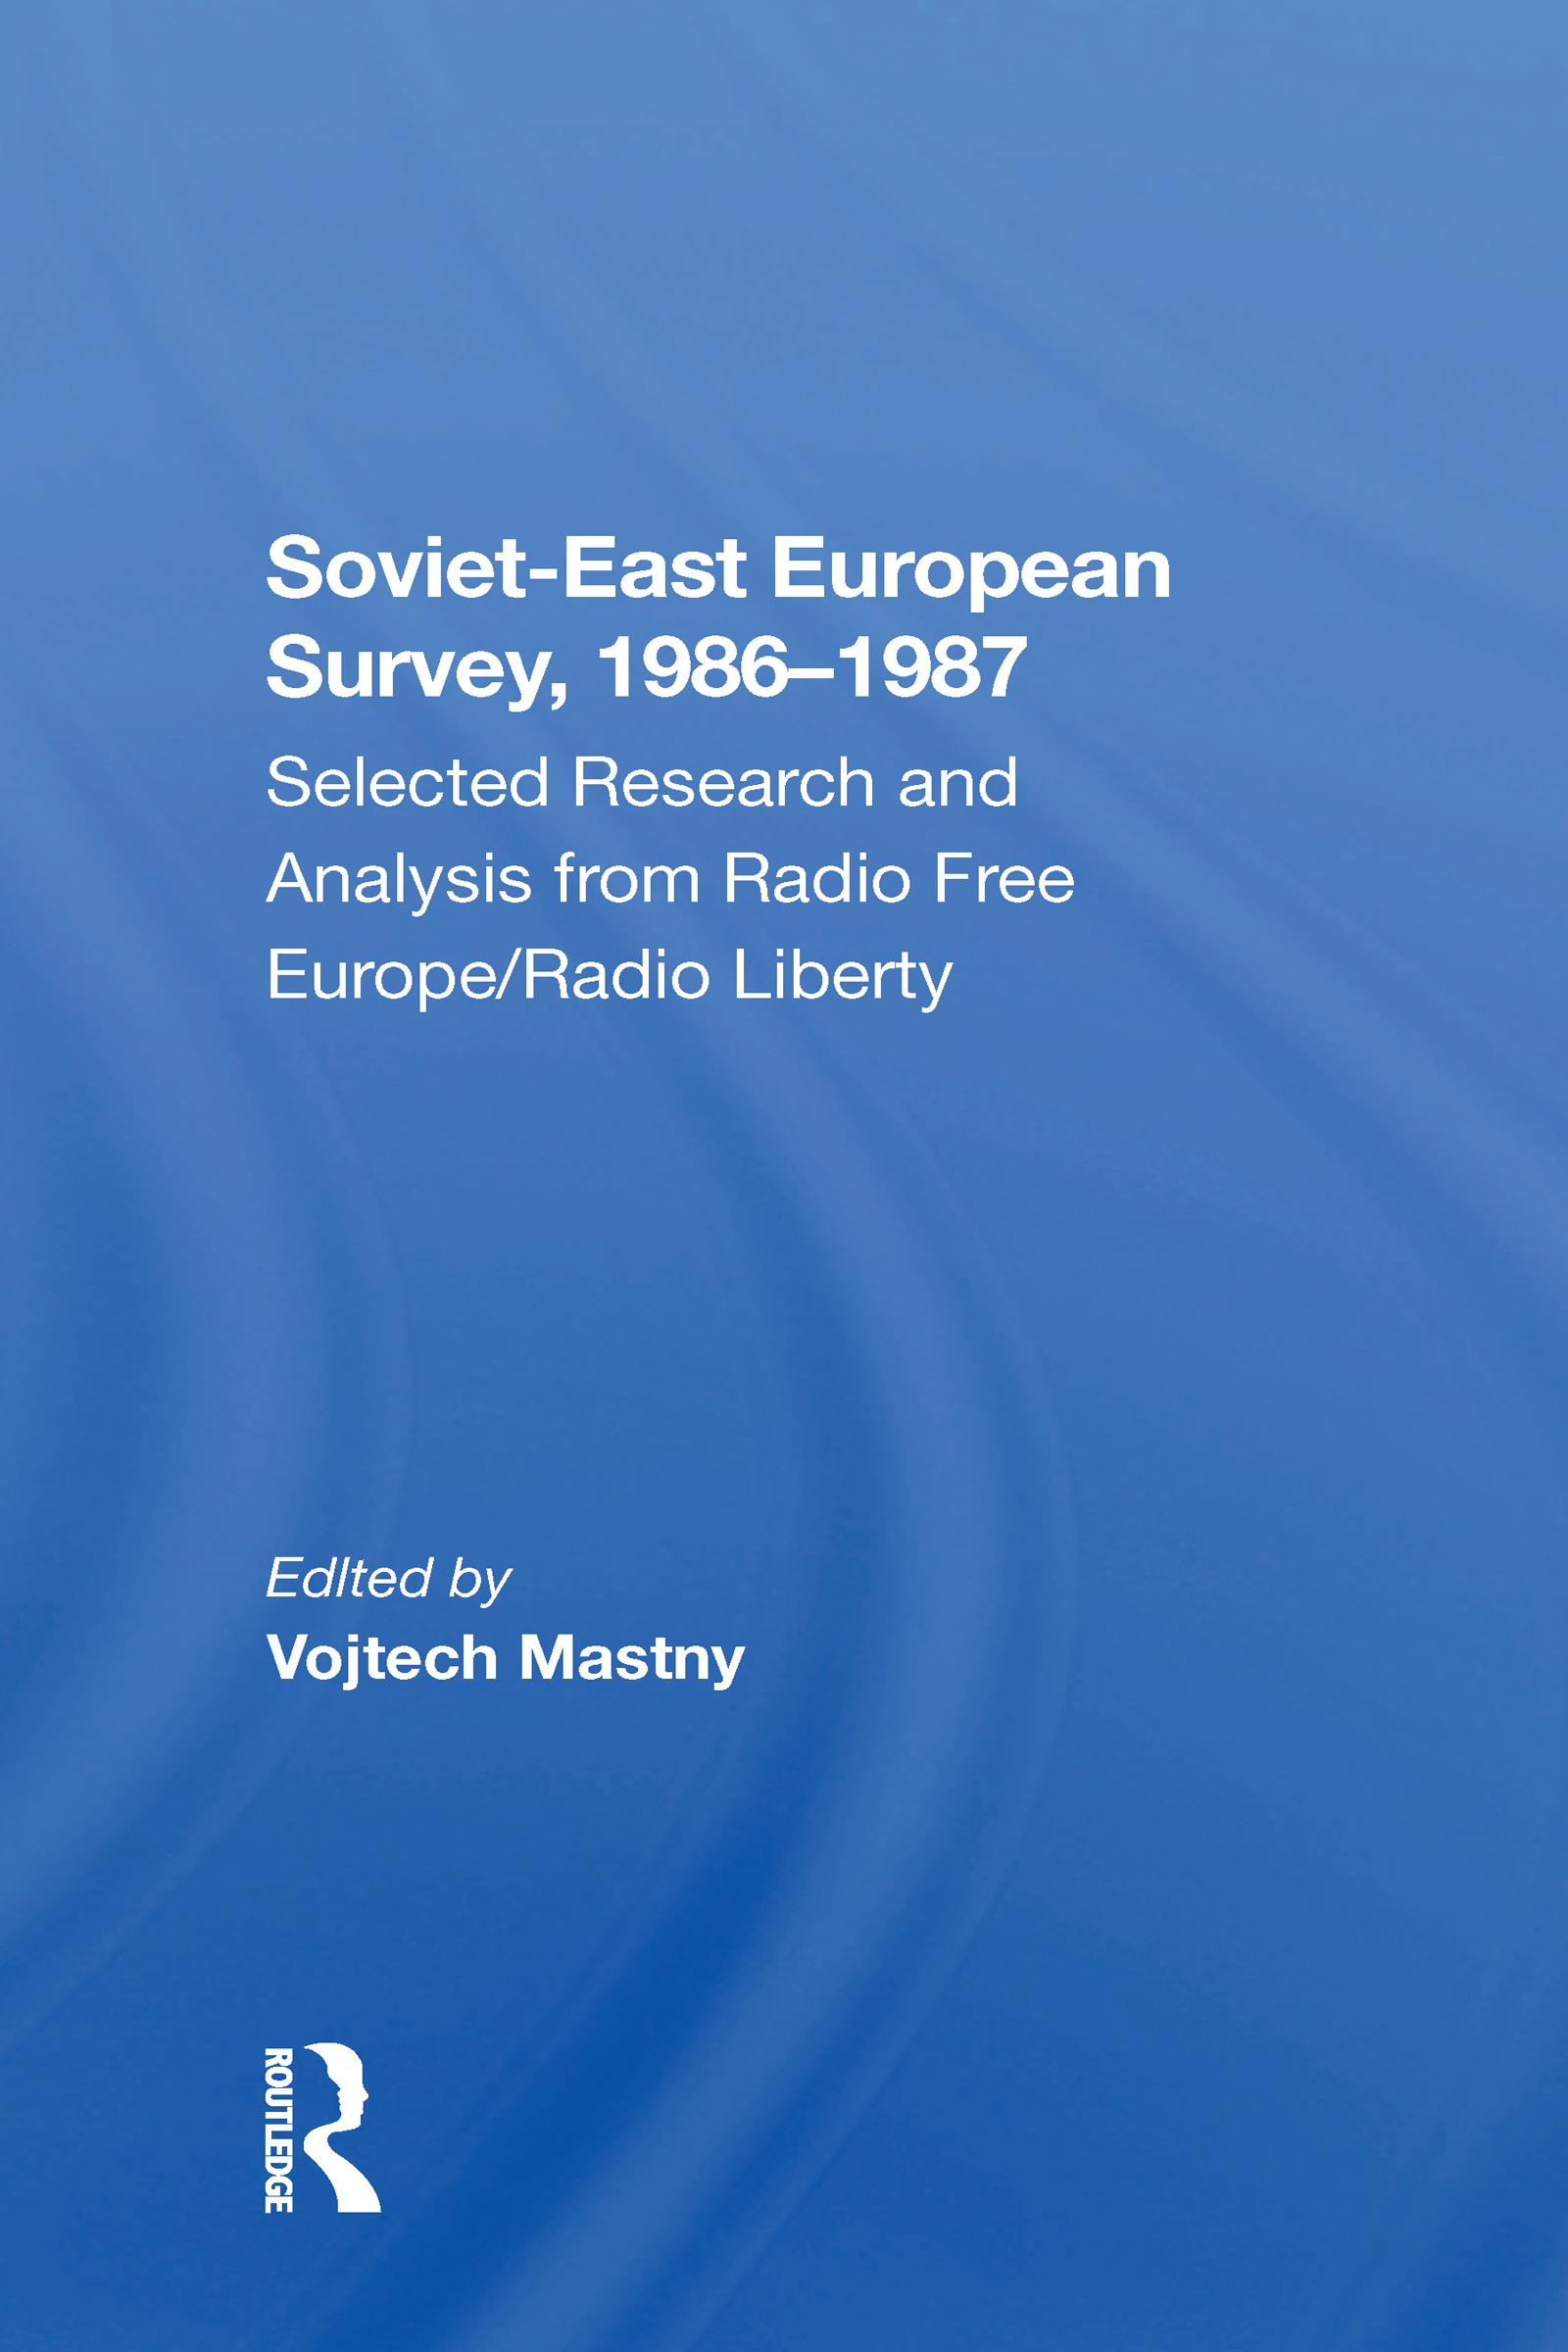 Soviet-east European Survey, 1986-1987